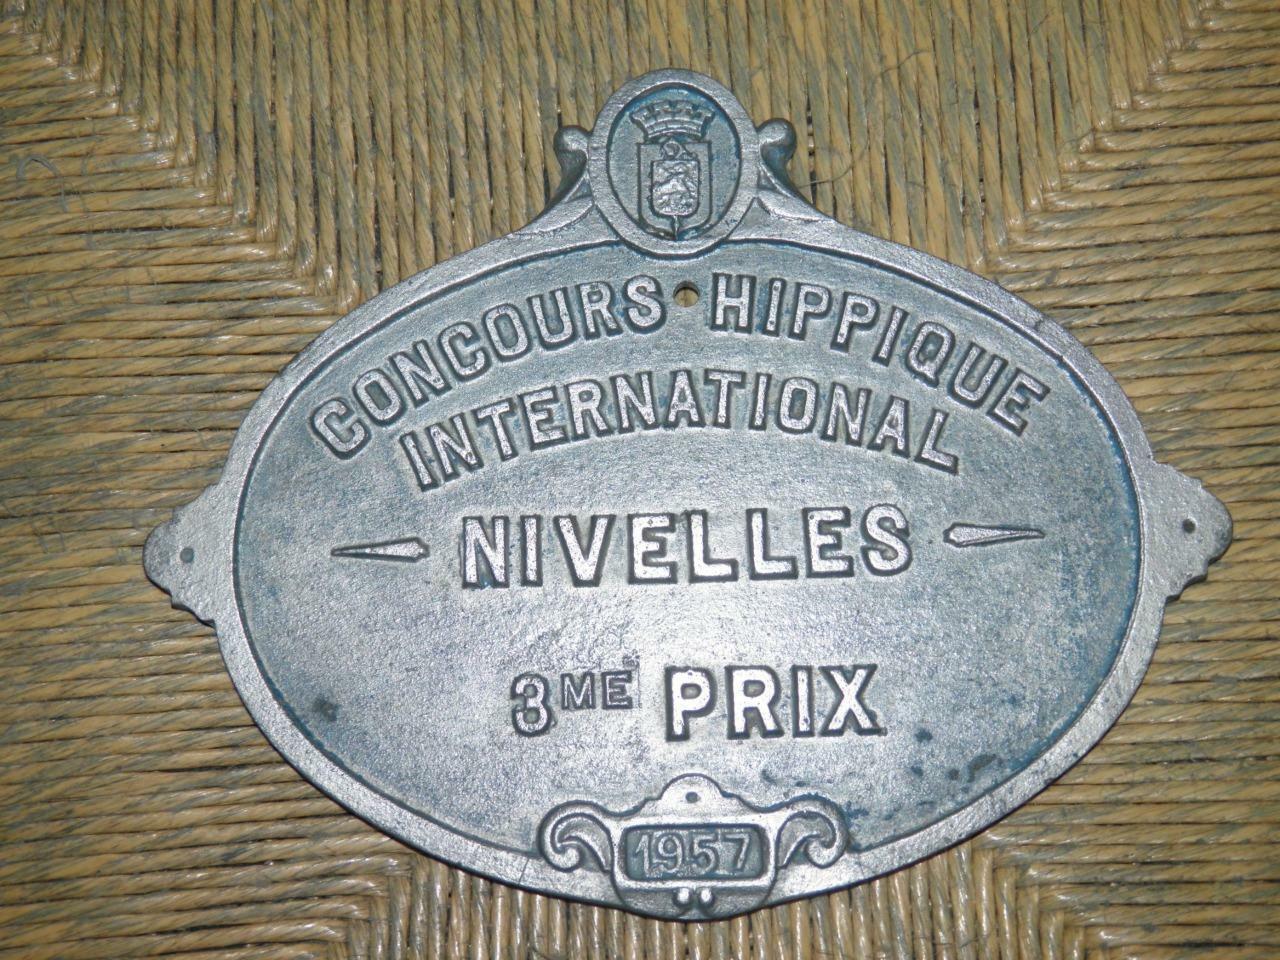 VINTAGE 'Concours HIPPIQUE Internazionale NIVELLES 1957' Equitazione Trofeo Muro